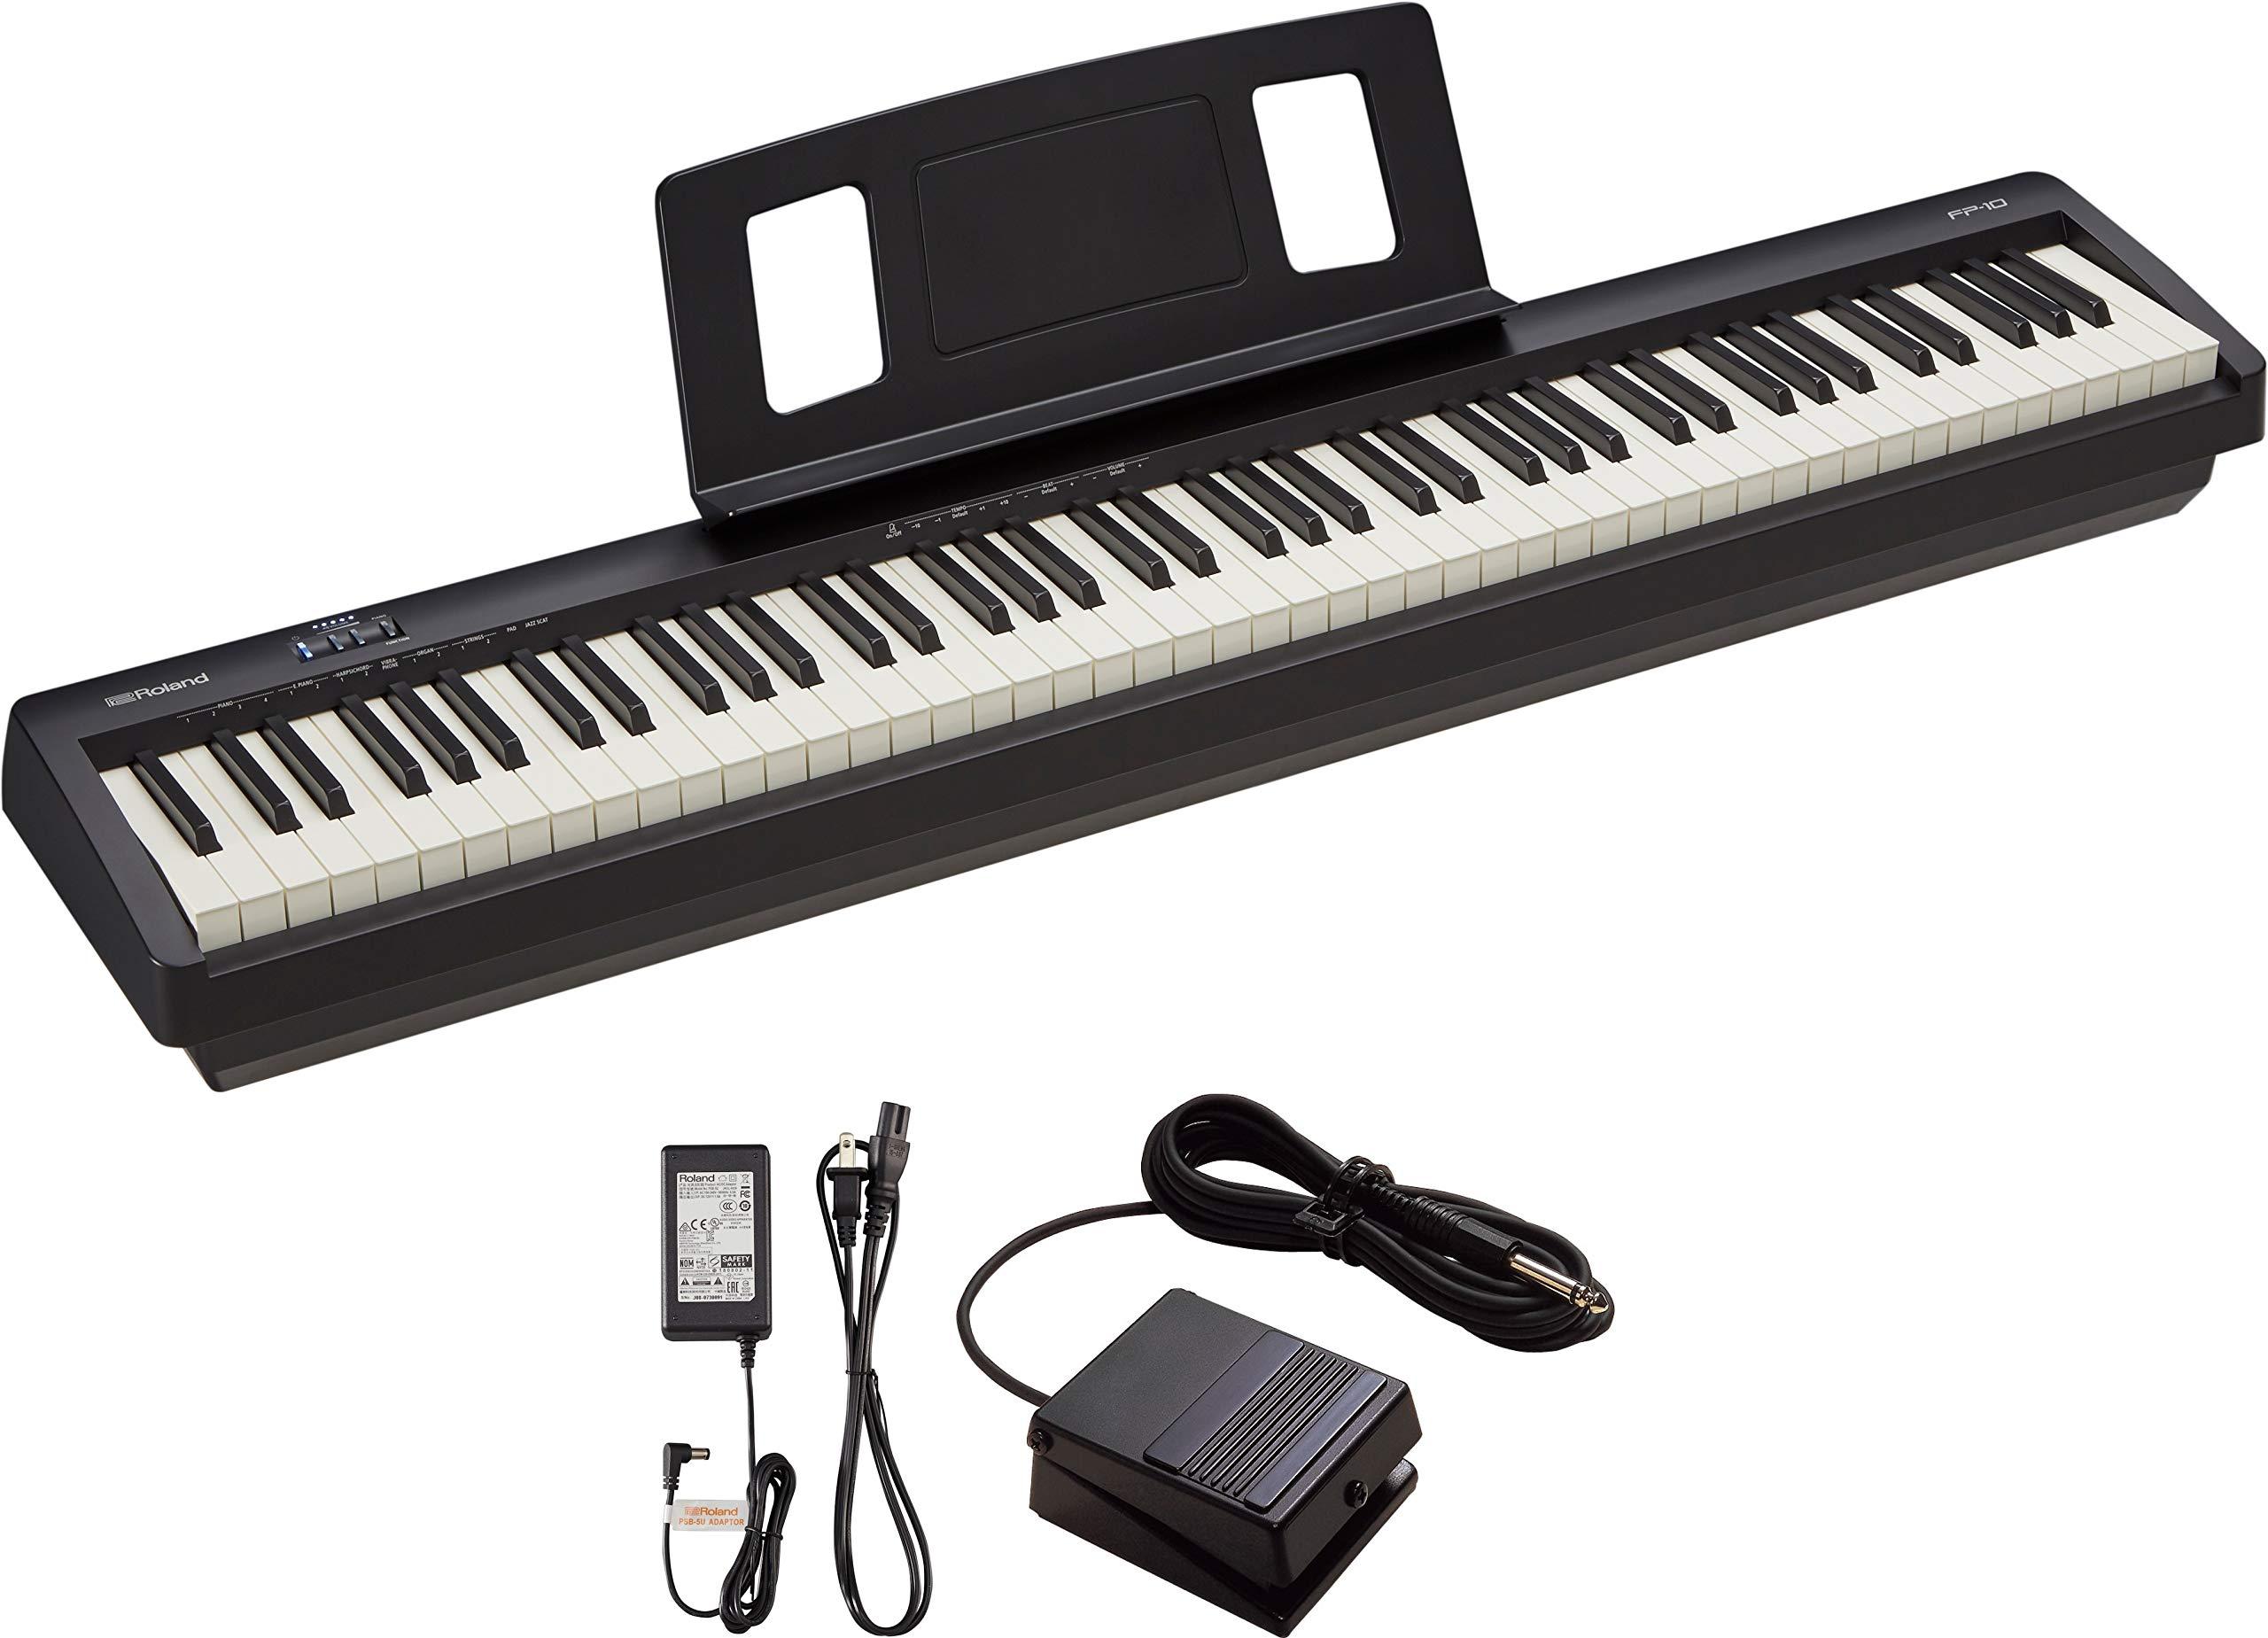 Roland 88-Key Entry-Level Digital Piano, Black (FP-10-BK) by Roland